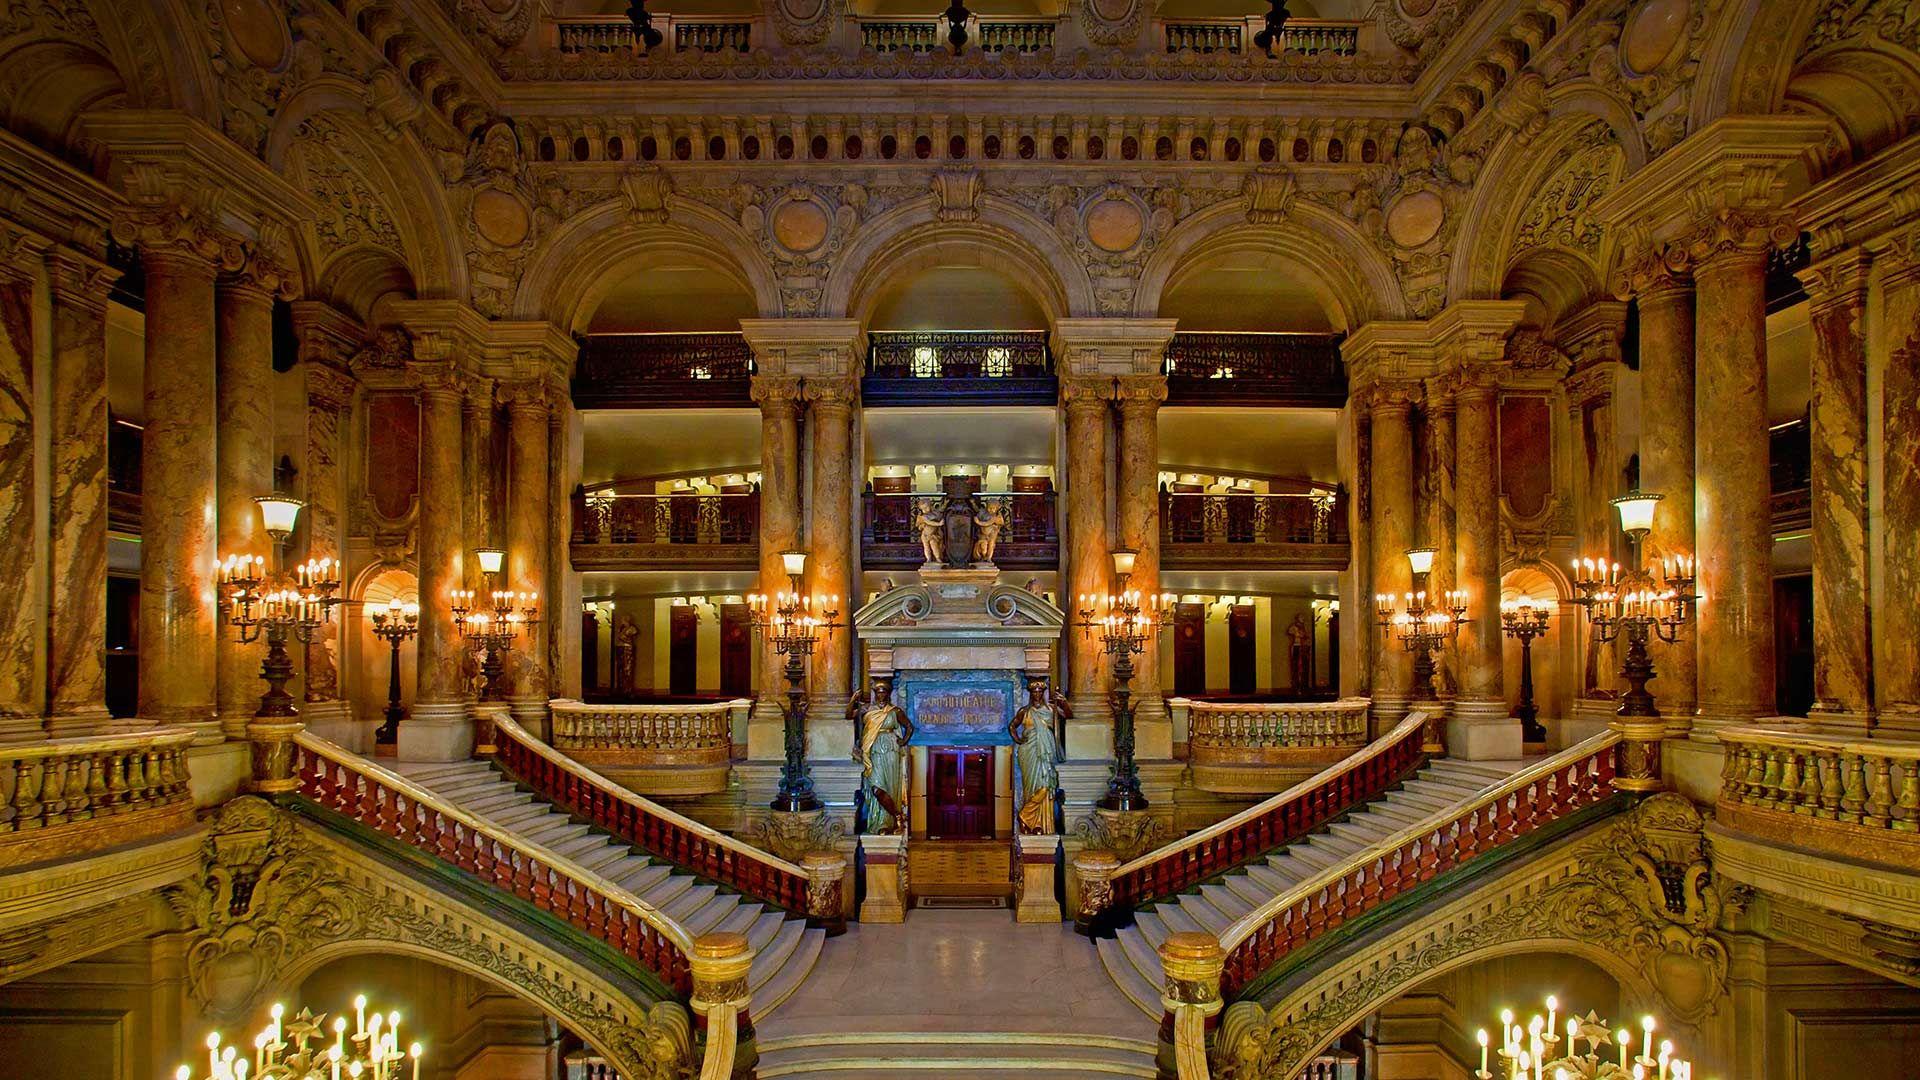 Palais Garnier in Paris, France (© John Kellerman/Alamy) – 2015-08-27  [http://www.bing.com/search?q=Palais+Garnier&form=hpcapt&filters=HpDate:%2220150827_0700%22]